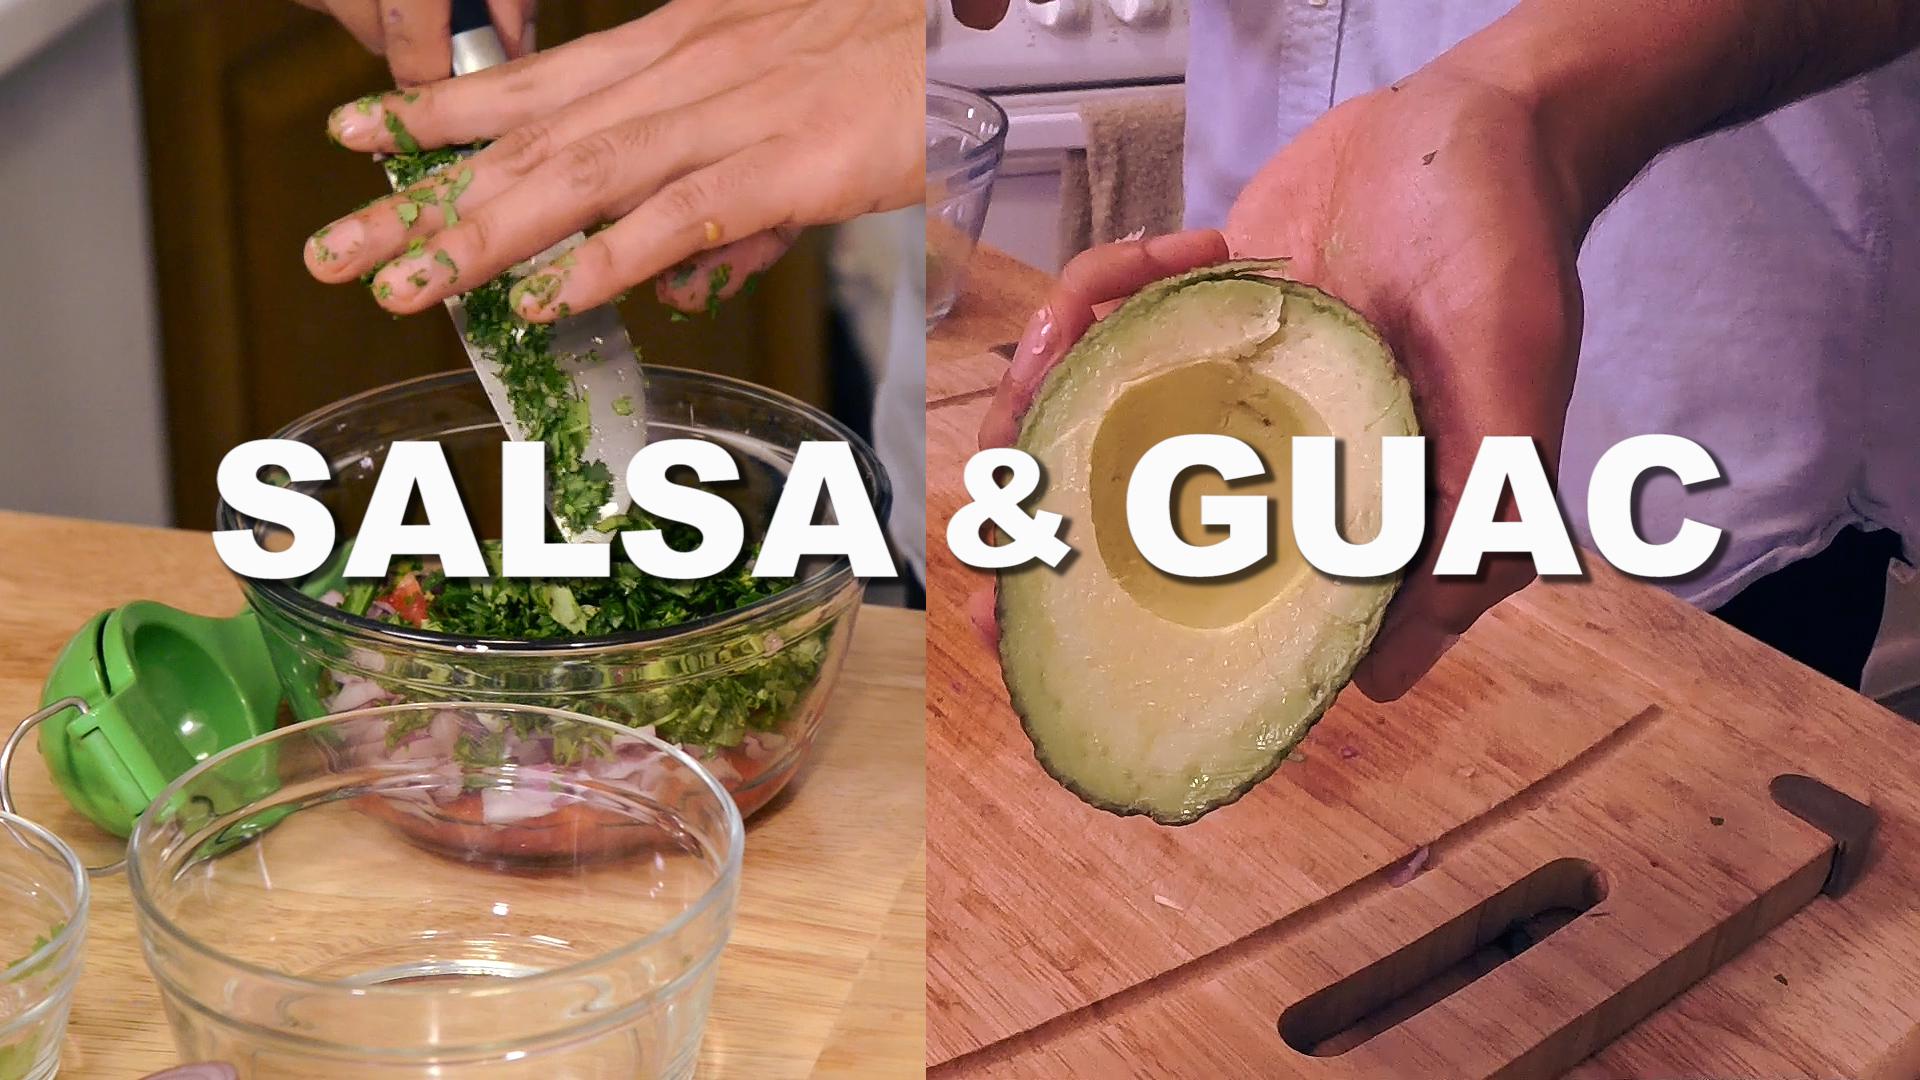 THE WORLD'S BEST GUACAMOLE & SALSA RECIPE